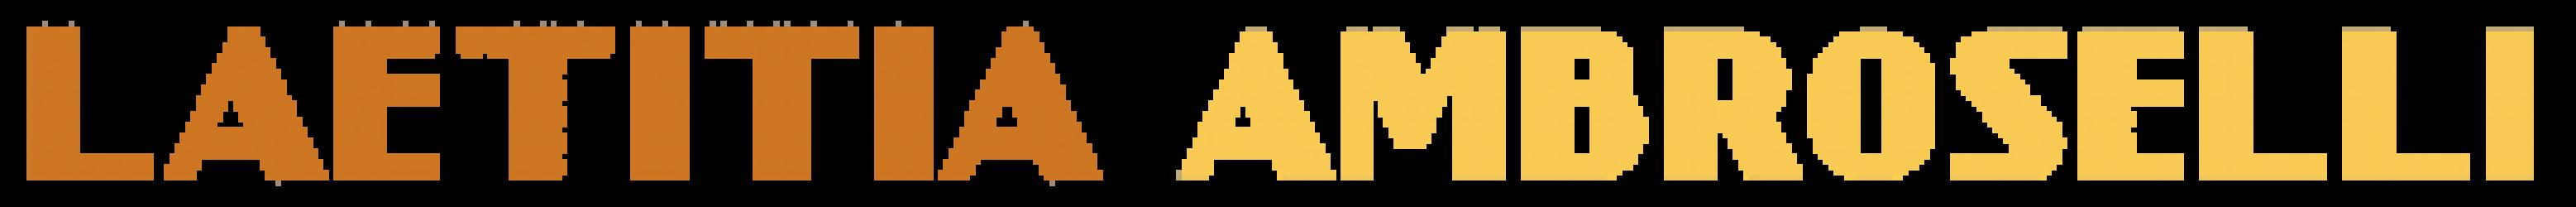 Laëtitia-Ambroselli-logo.png